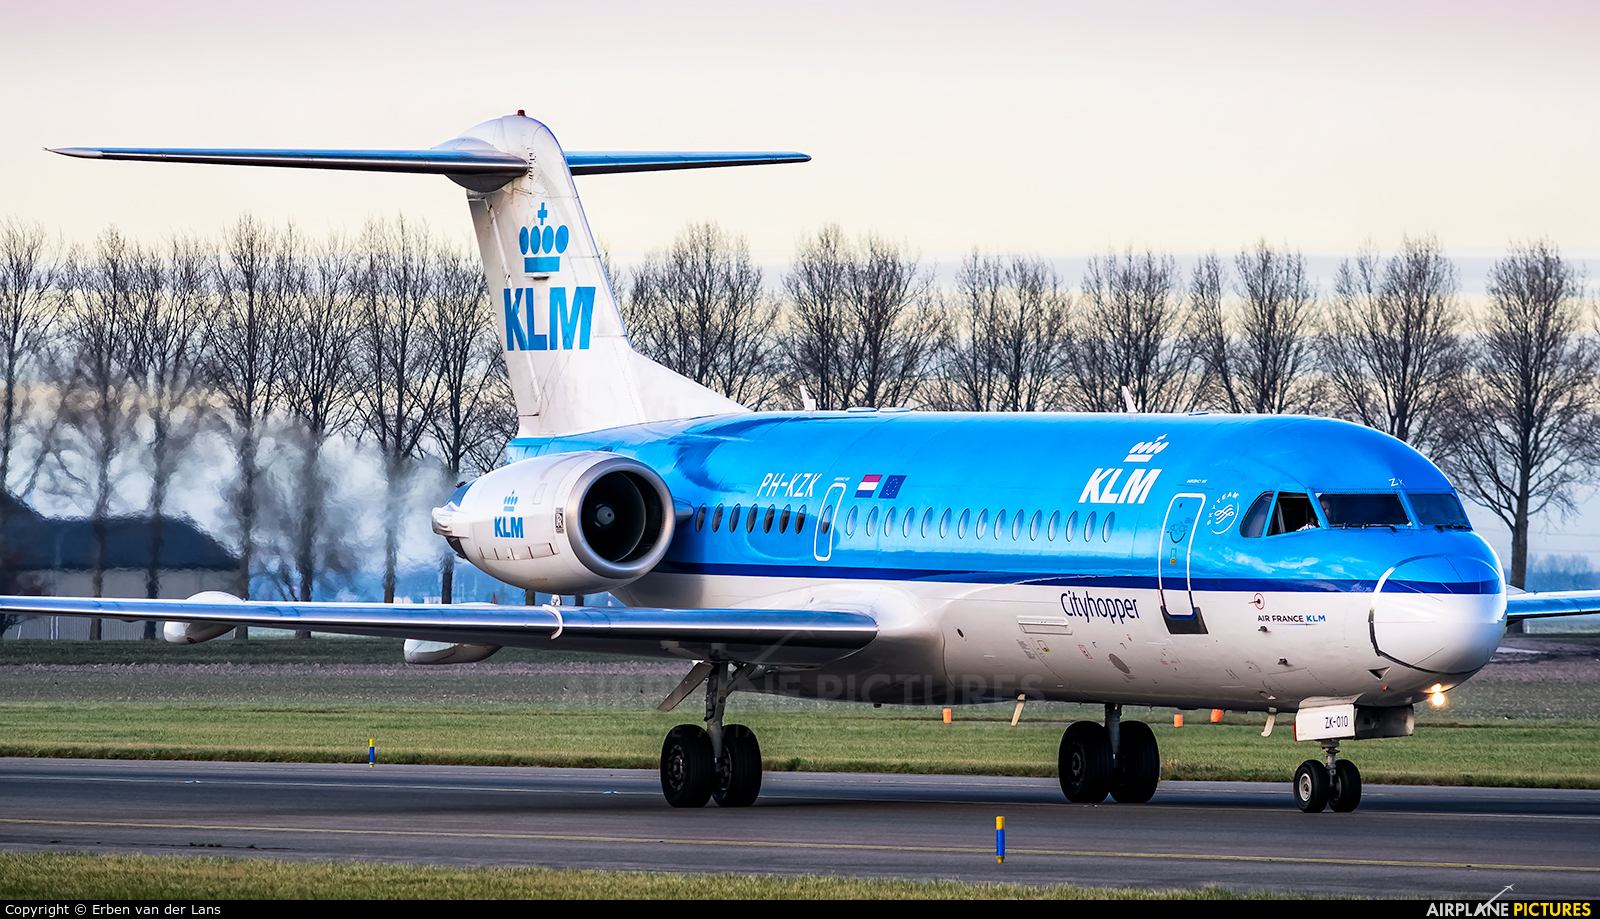 KLM Cityhopper PH-KZK aircraft at Amsterdam - Schiphol